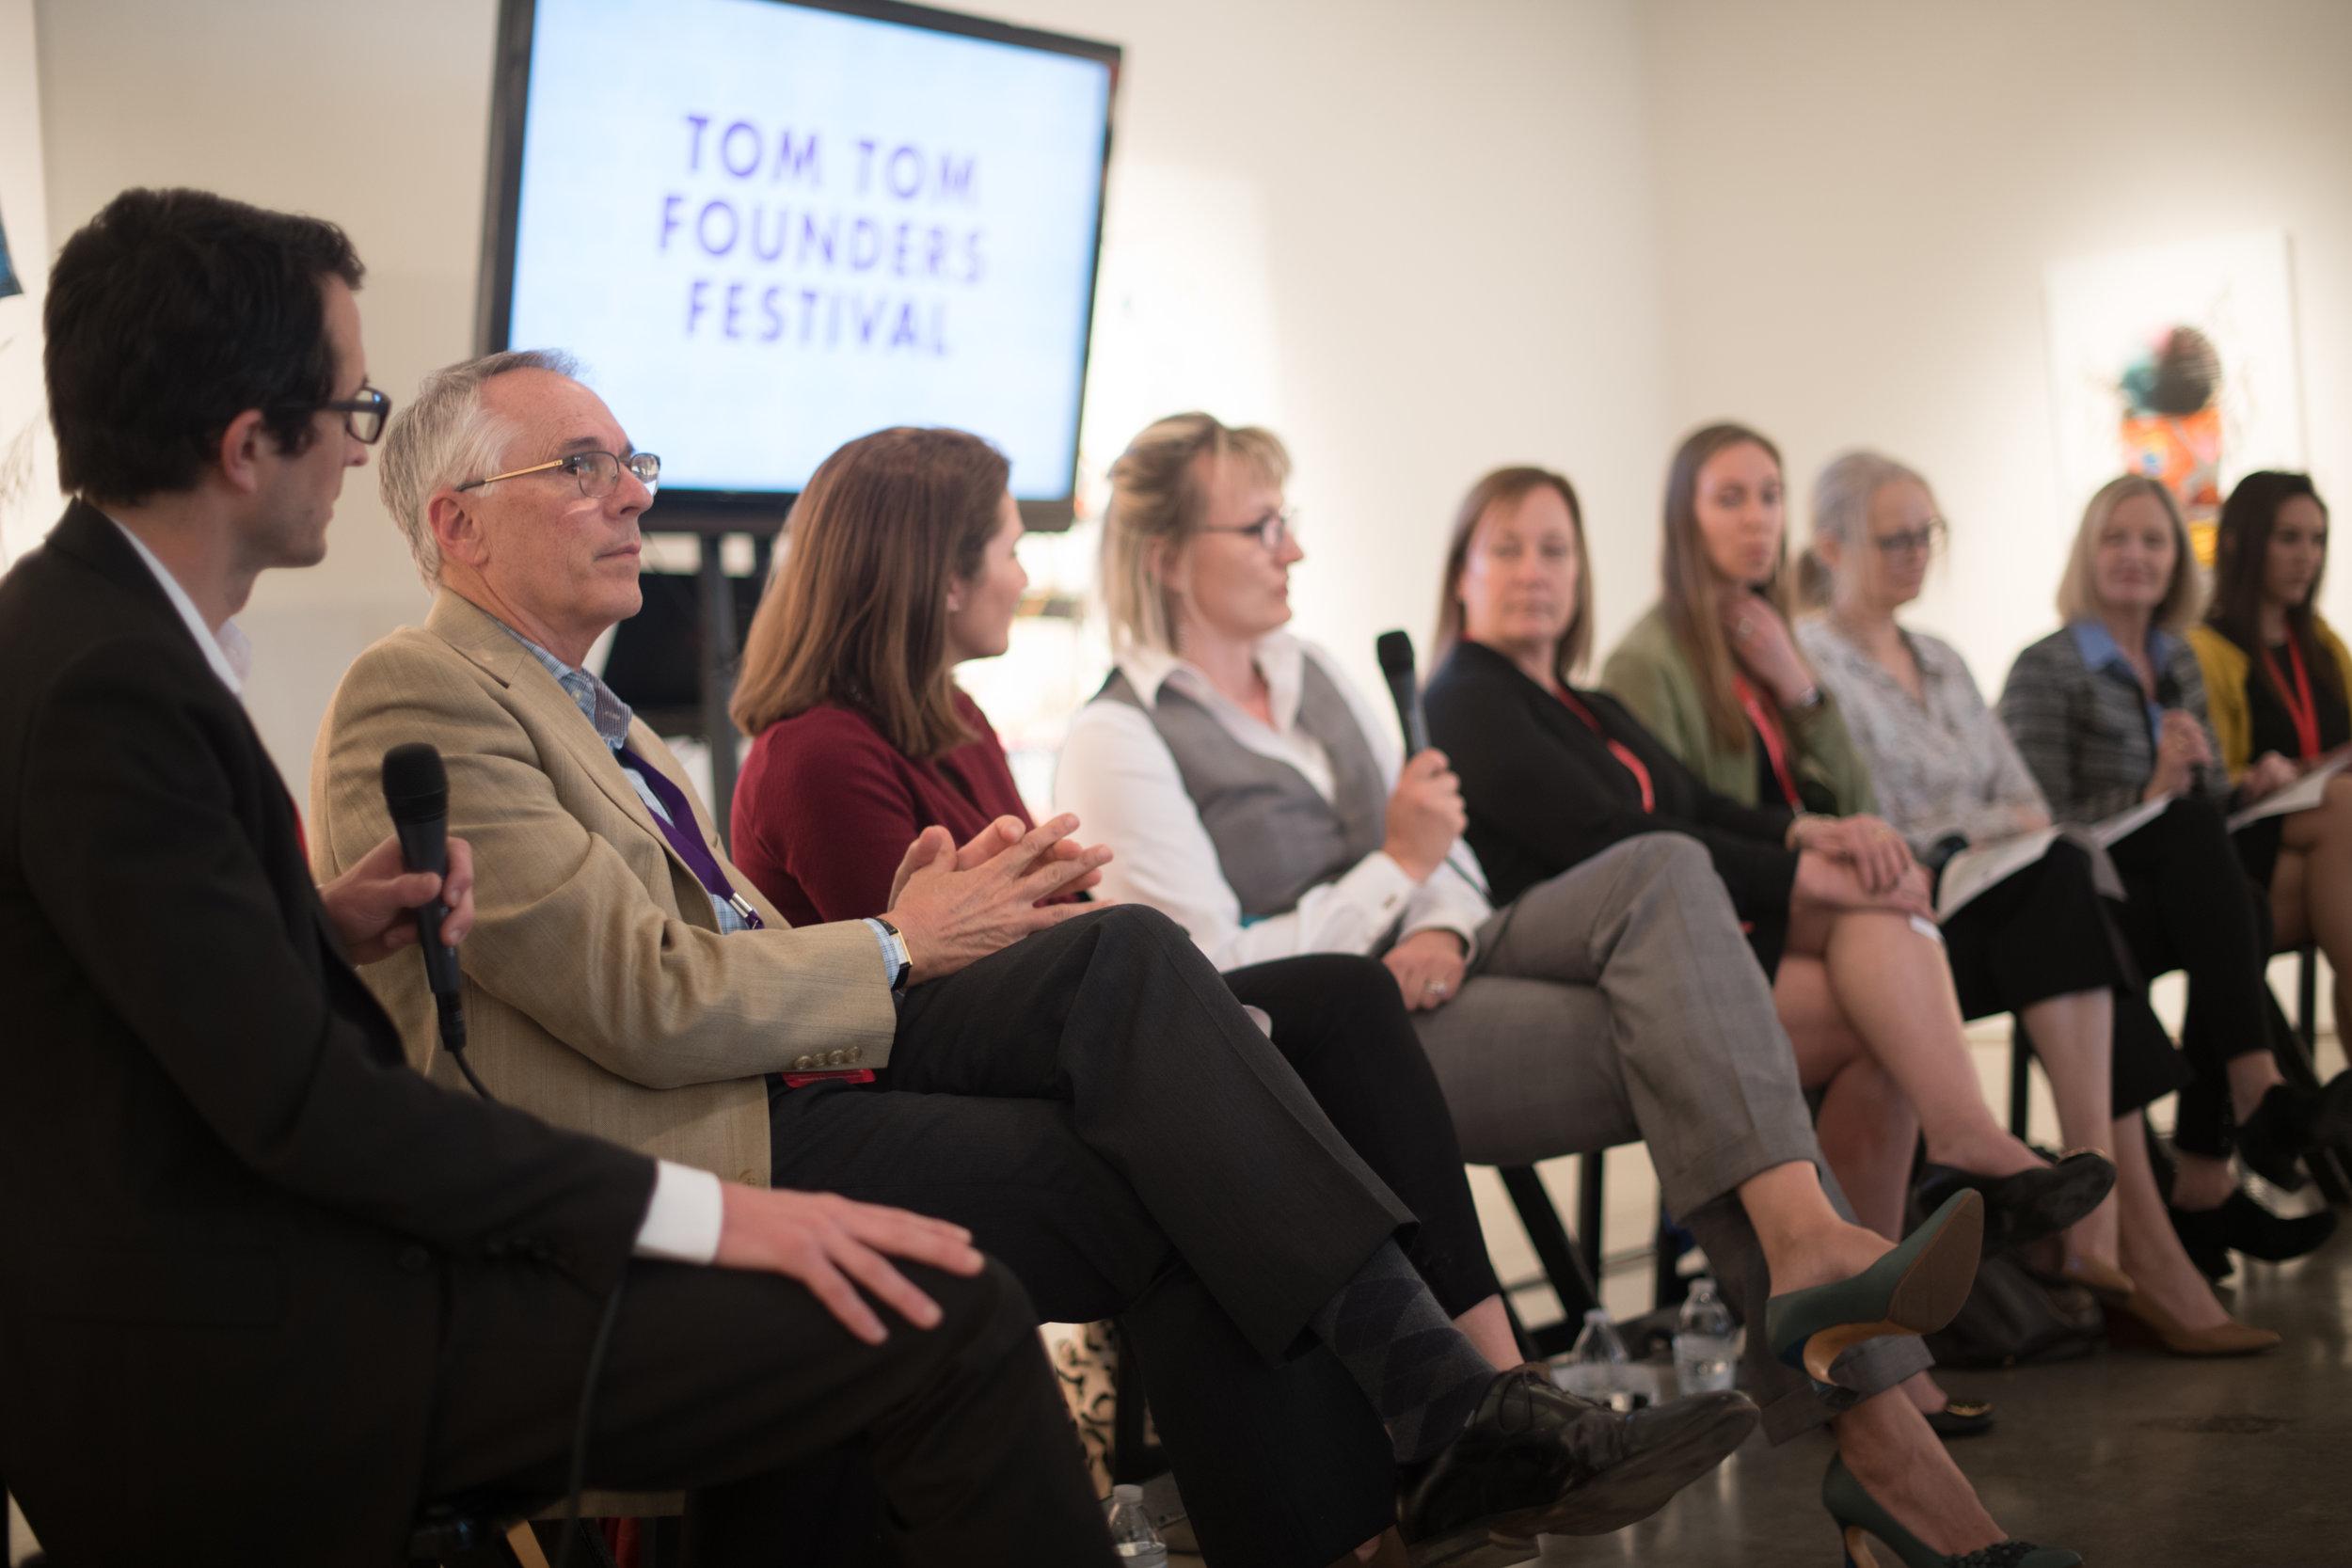 We had a wonderful time at the Tom Tom Festival presenting our Virginia is For Impact Investing Lovers panel!  Many thanks to Ed Gerardo, Jen Gionvannitti, Elena Loutskina, Caroline Nowery, Katherine St. Onge, Roberta Keller, Kathy Neumann, Sydney England and Stephanie Randolph.